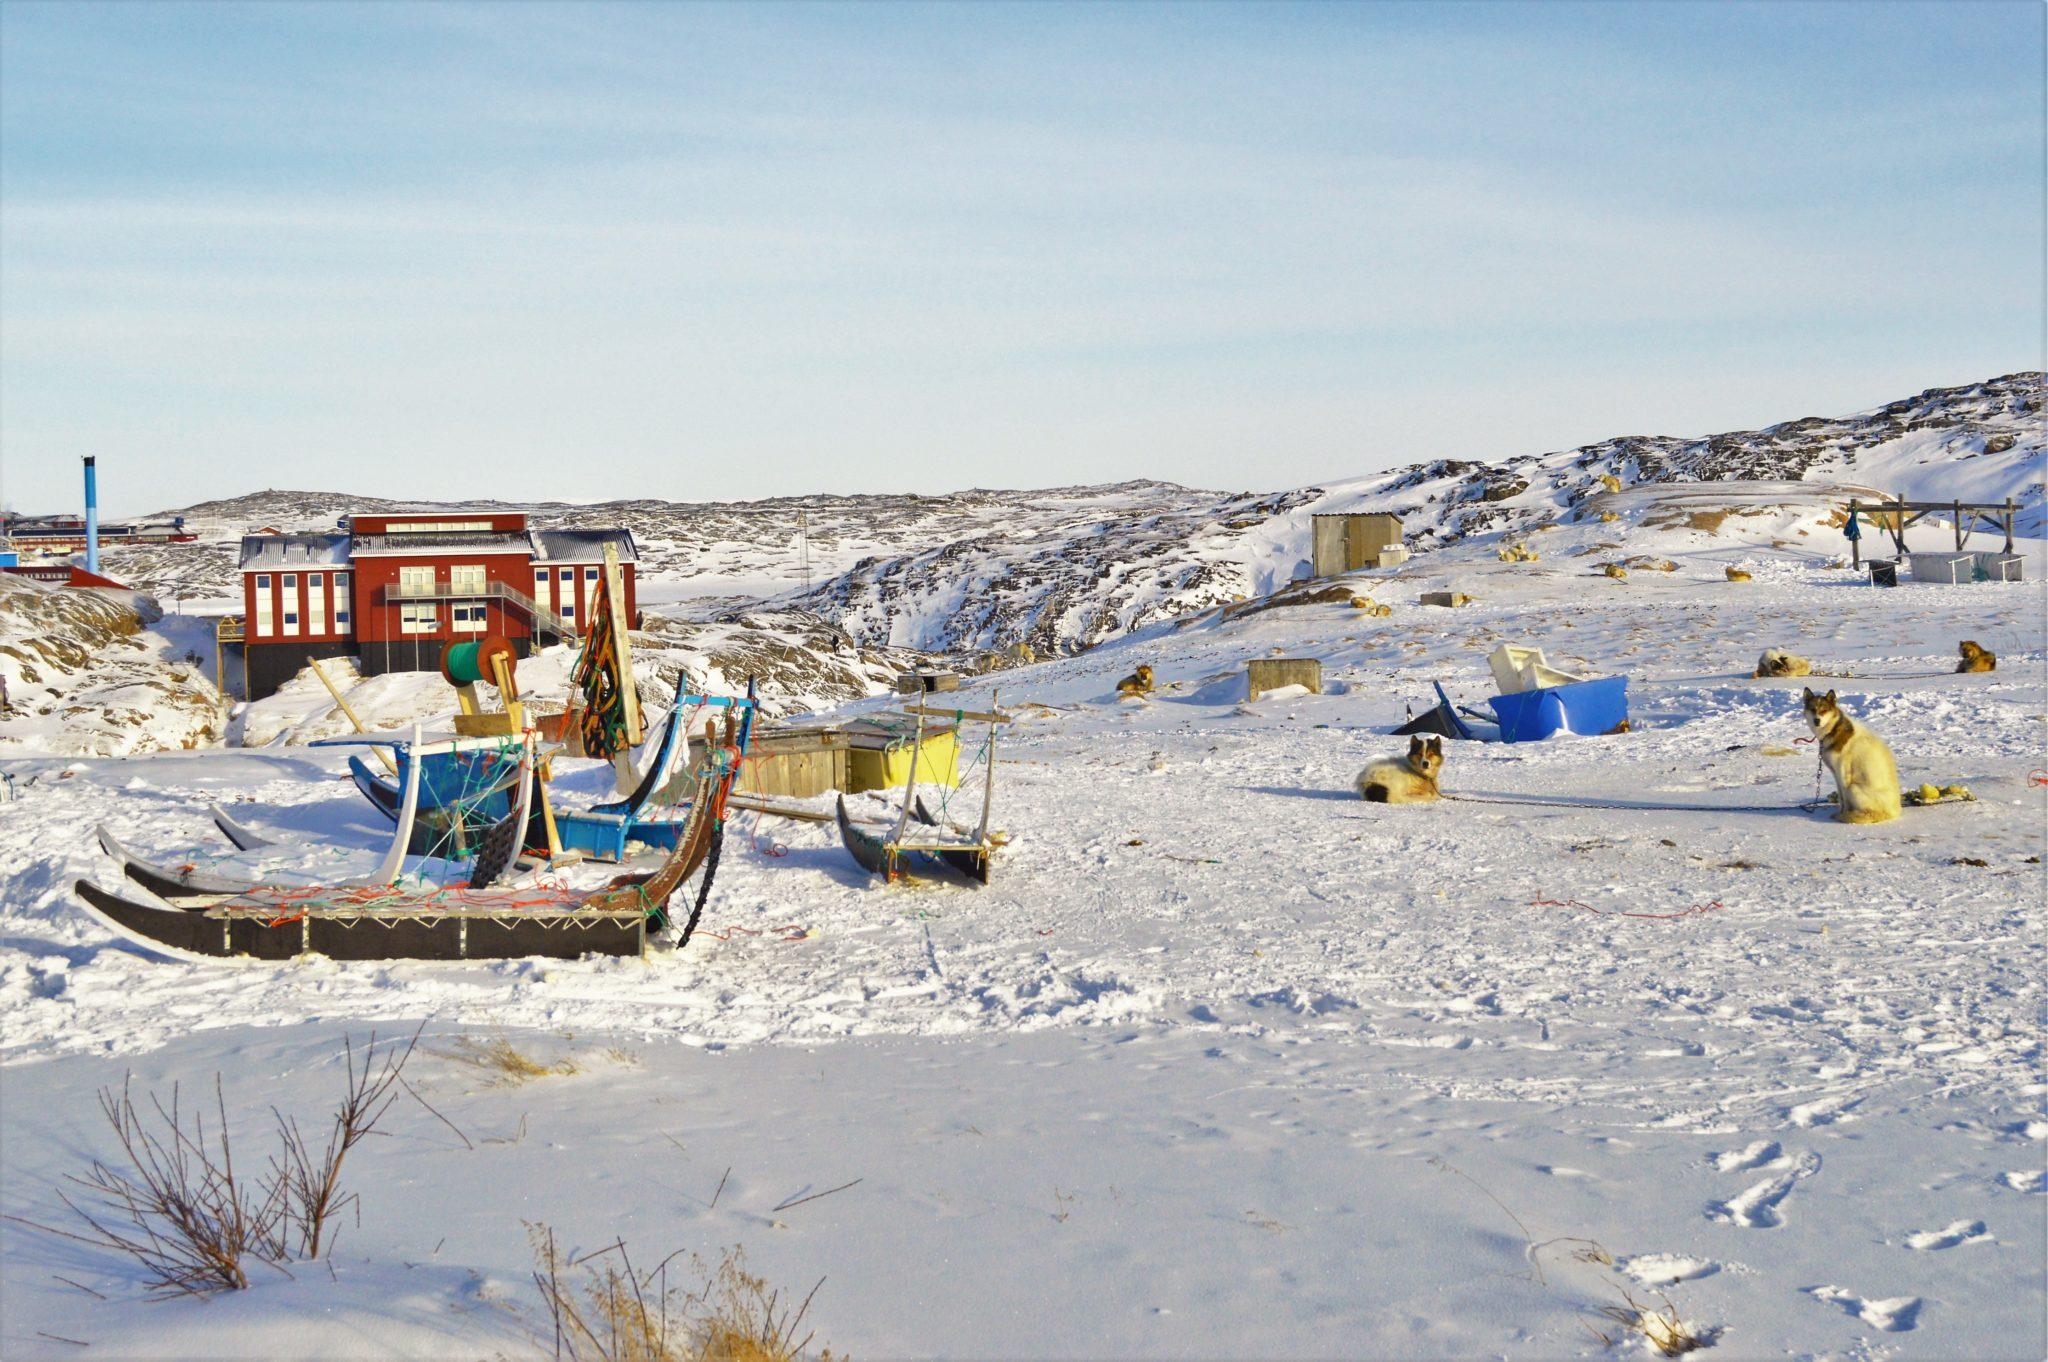 Dog farm in Ilulissat, Greenland